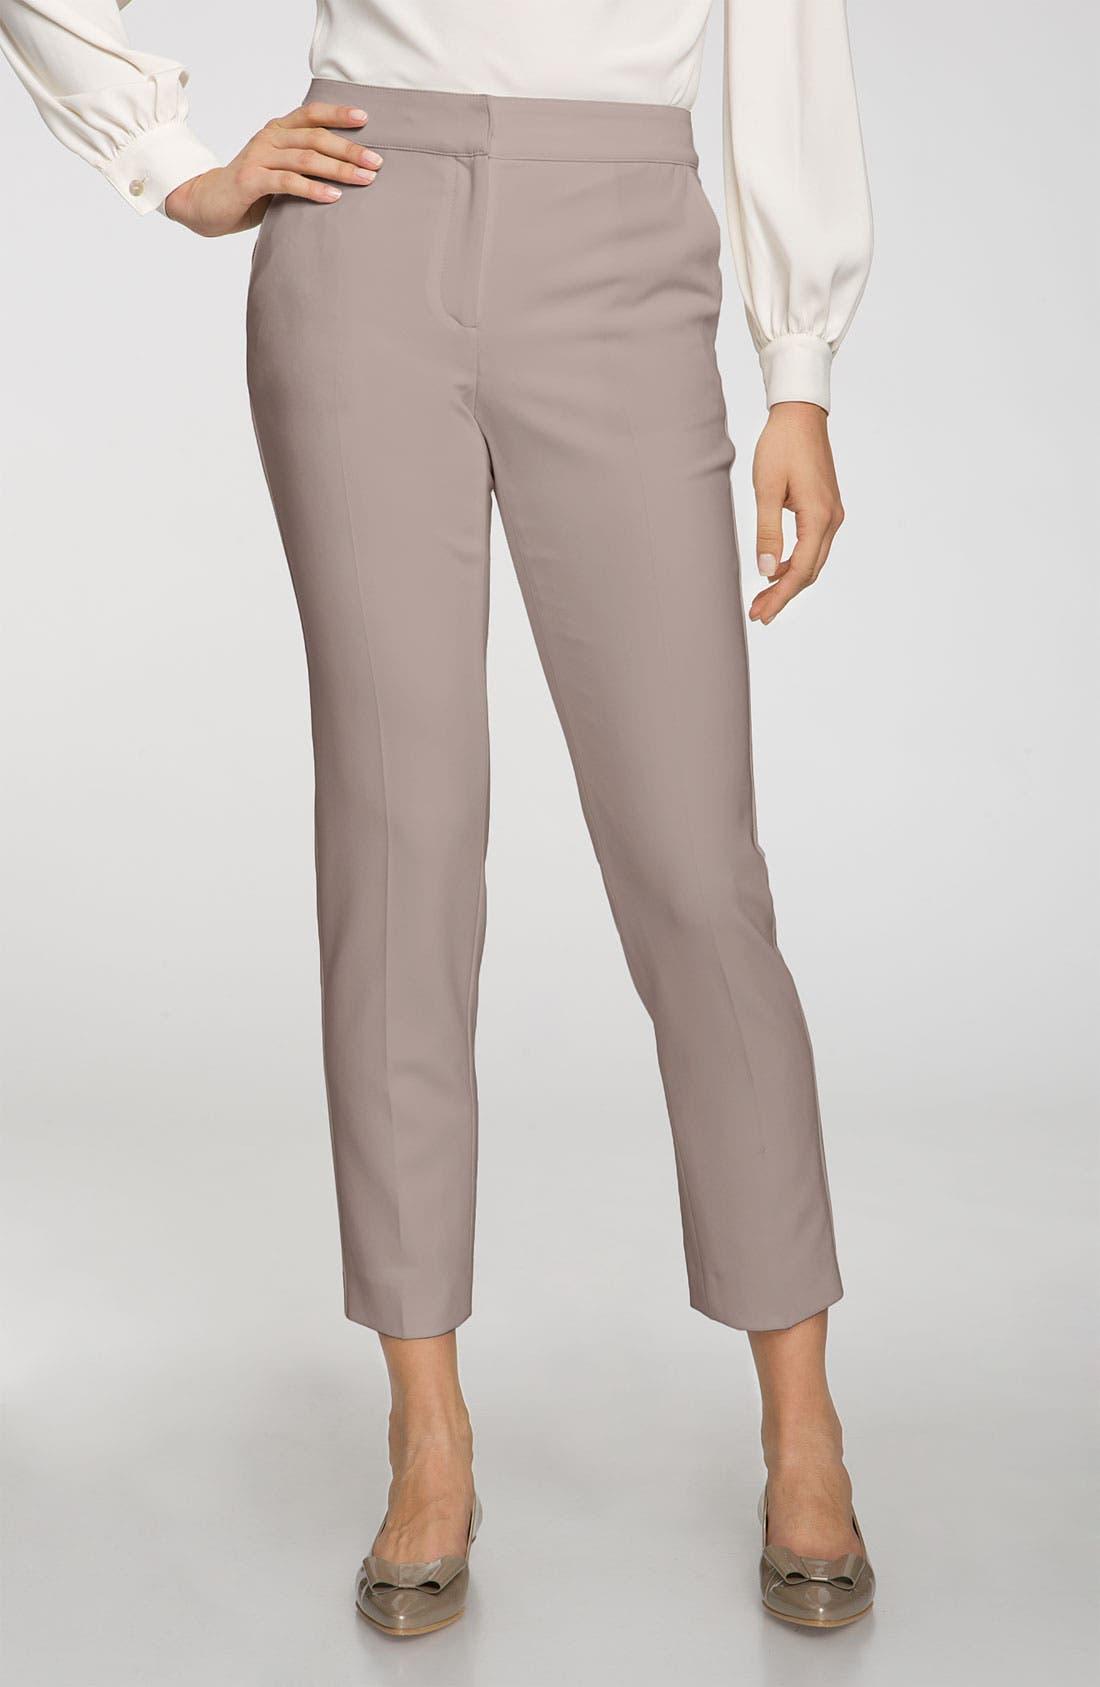 Main Image - St. John Collection 'Emma' Crepe Marocain Crop Pants